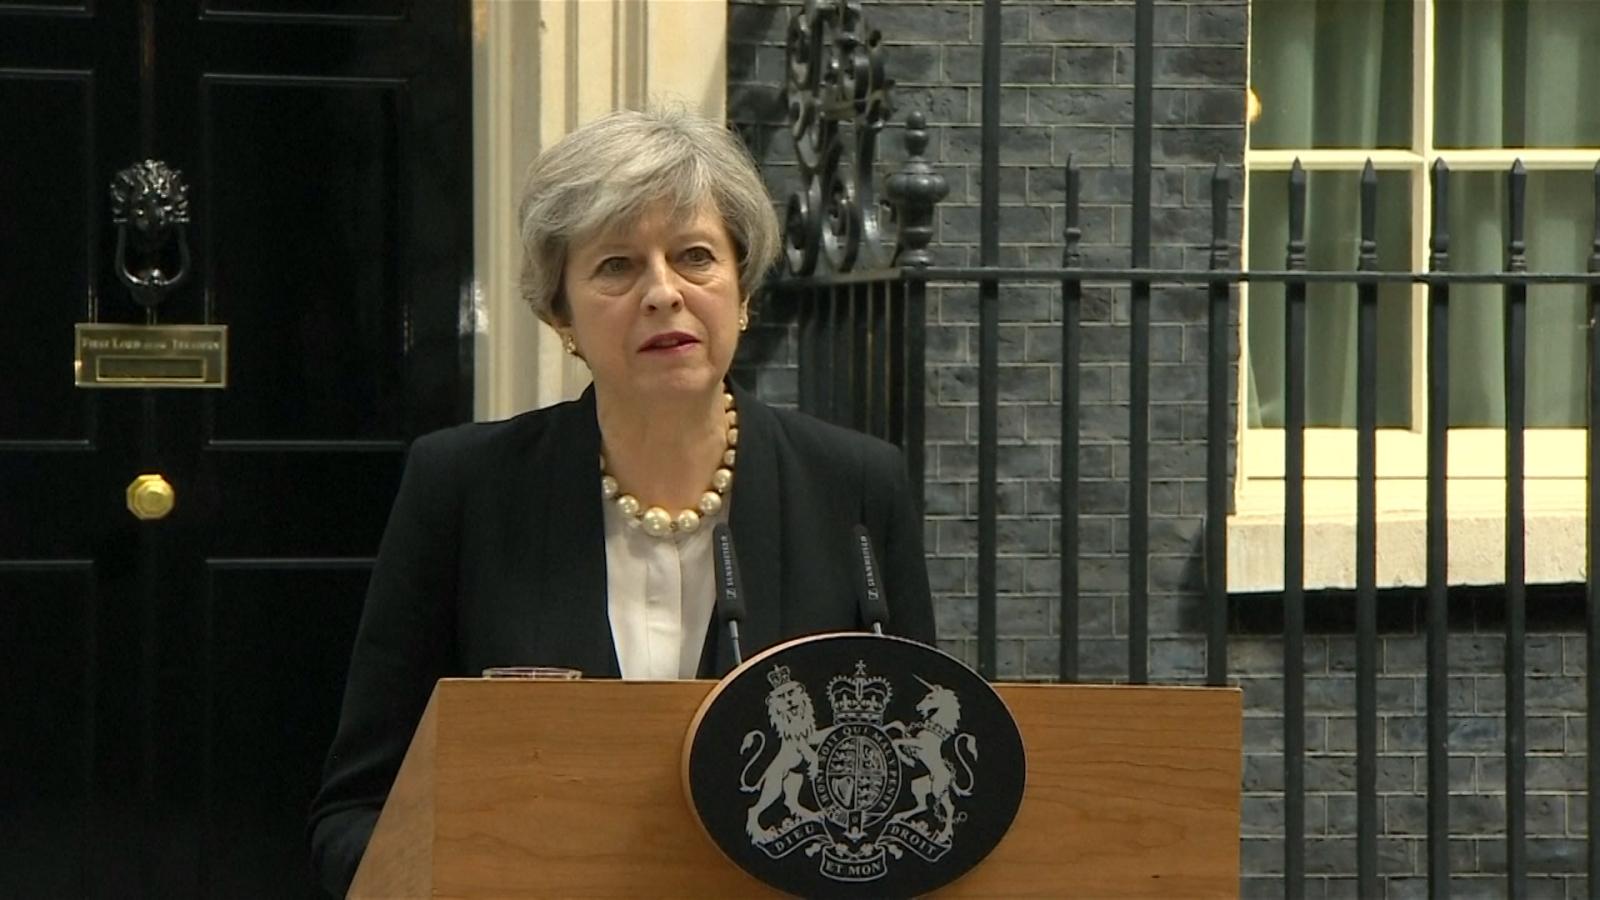 U.K. Prime Minister May Condemns 'Callous Terrorist Attack' In Manchester